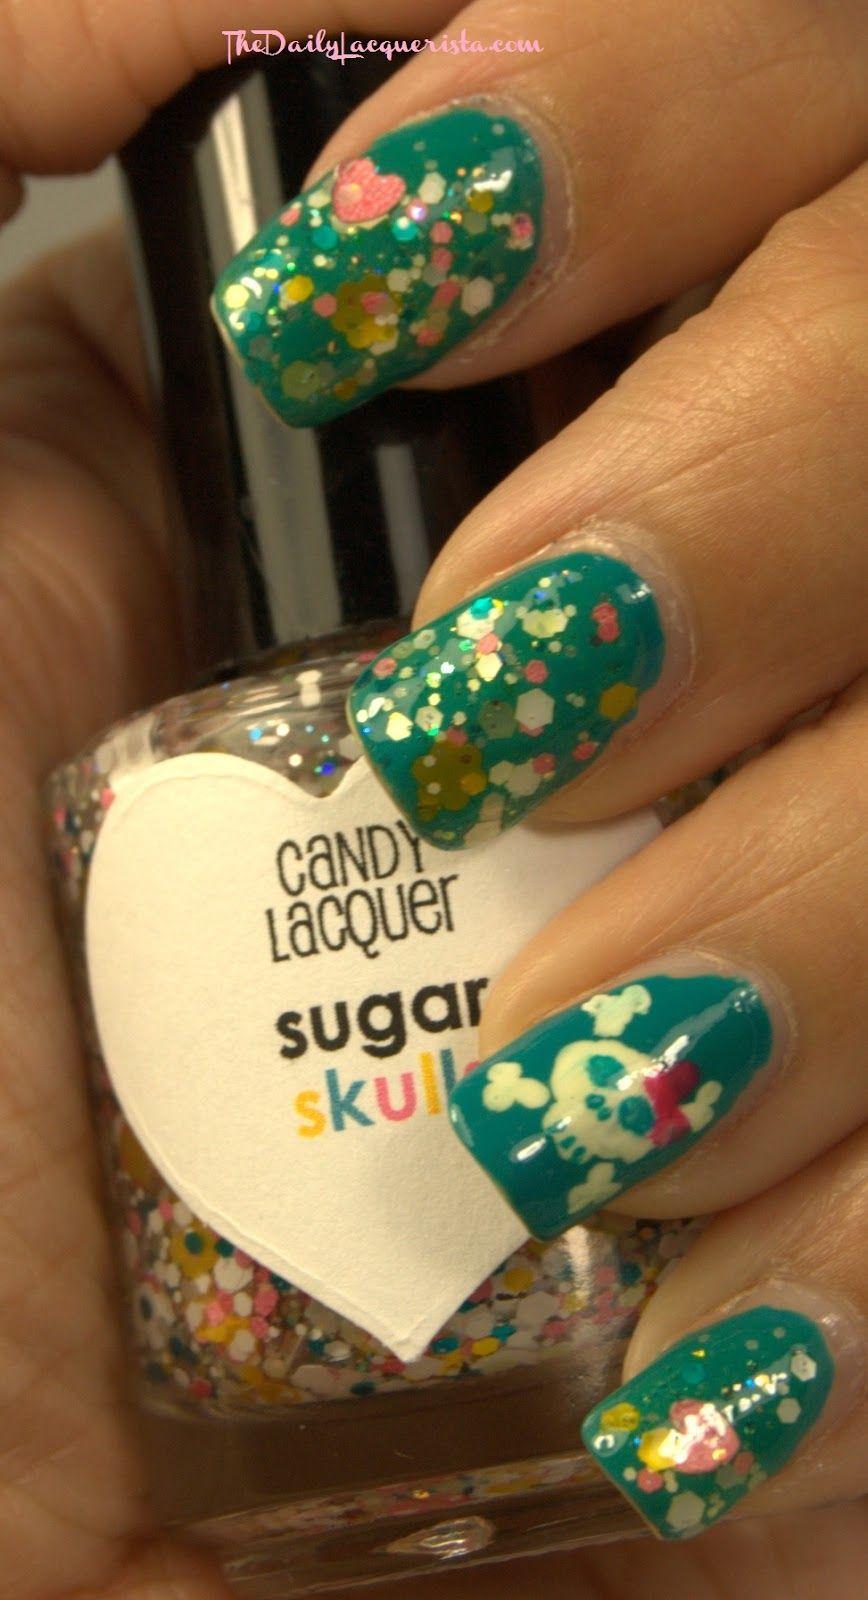 Candy Lacquer Sugar Skulls over Butter London Slapper